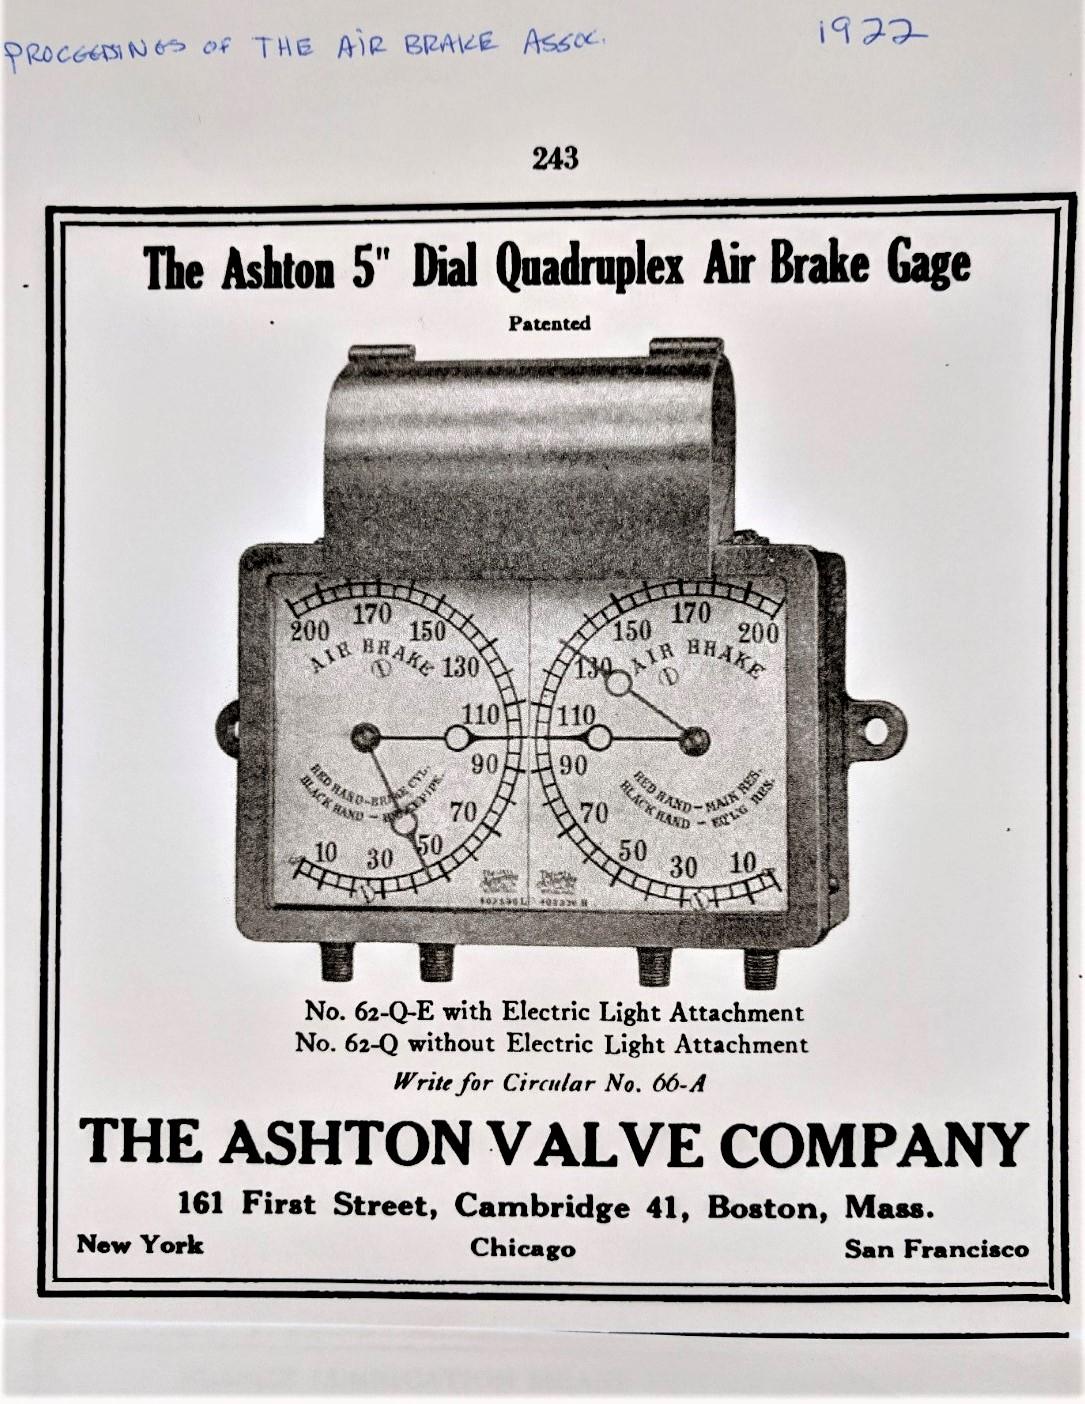 1922 Proceedings of the Air Brake Association.jpg